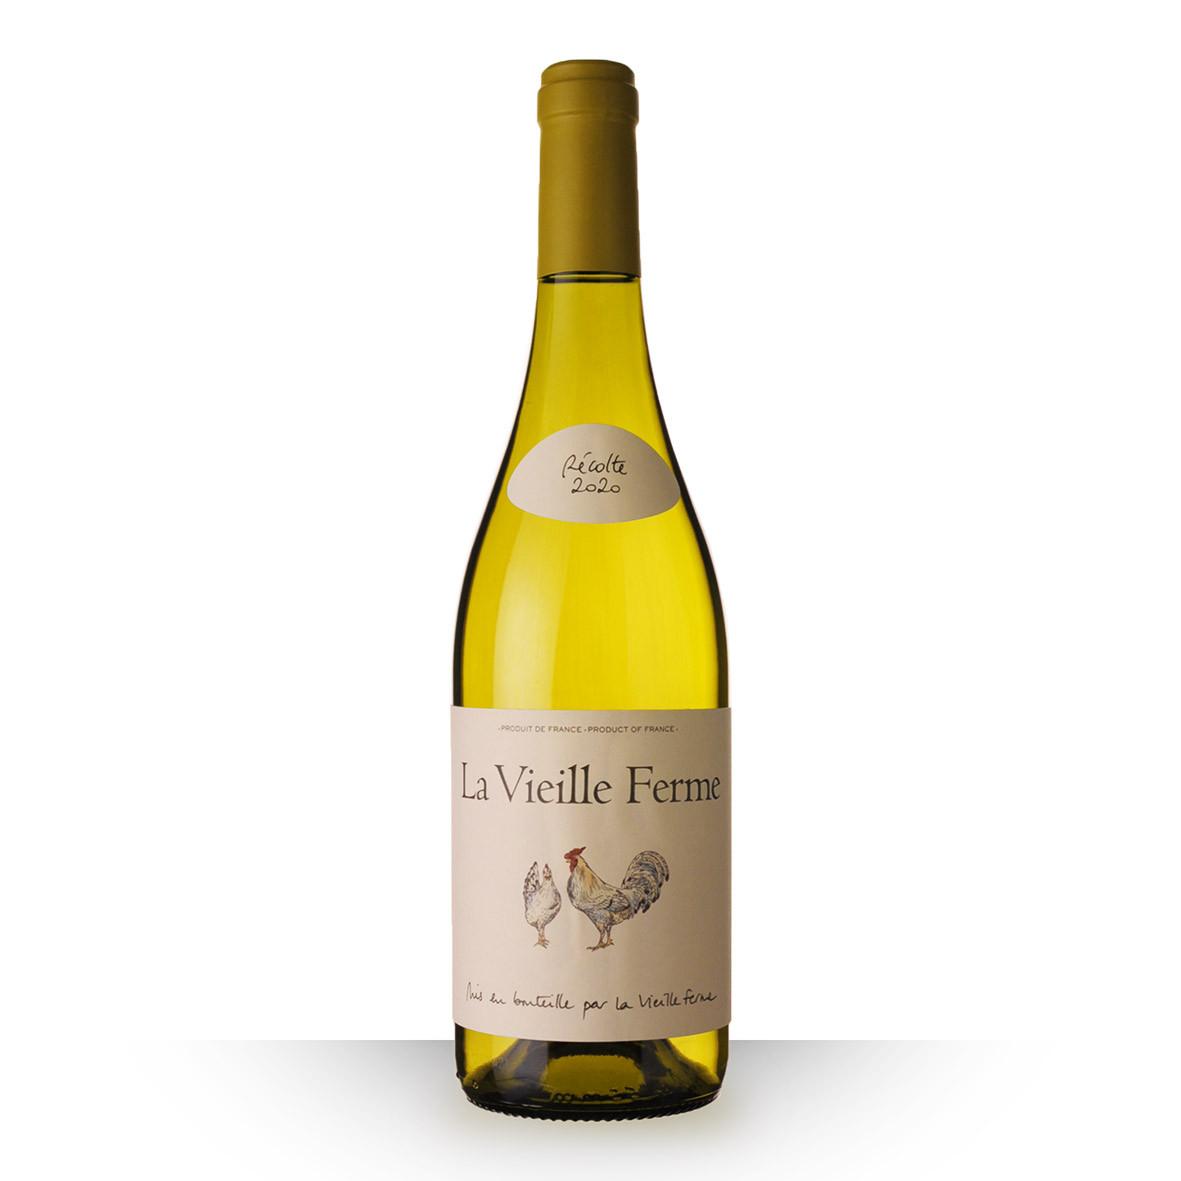 La Vieille Ferme Luberon Blanc 2020 75cl www.odyssee-vins.com